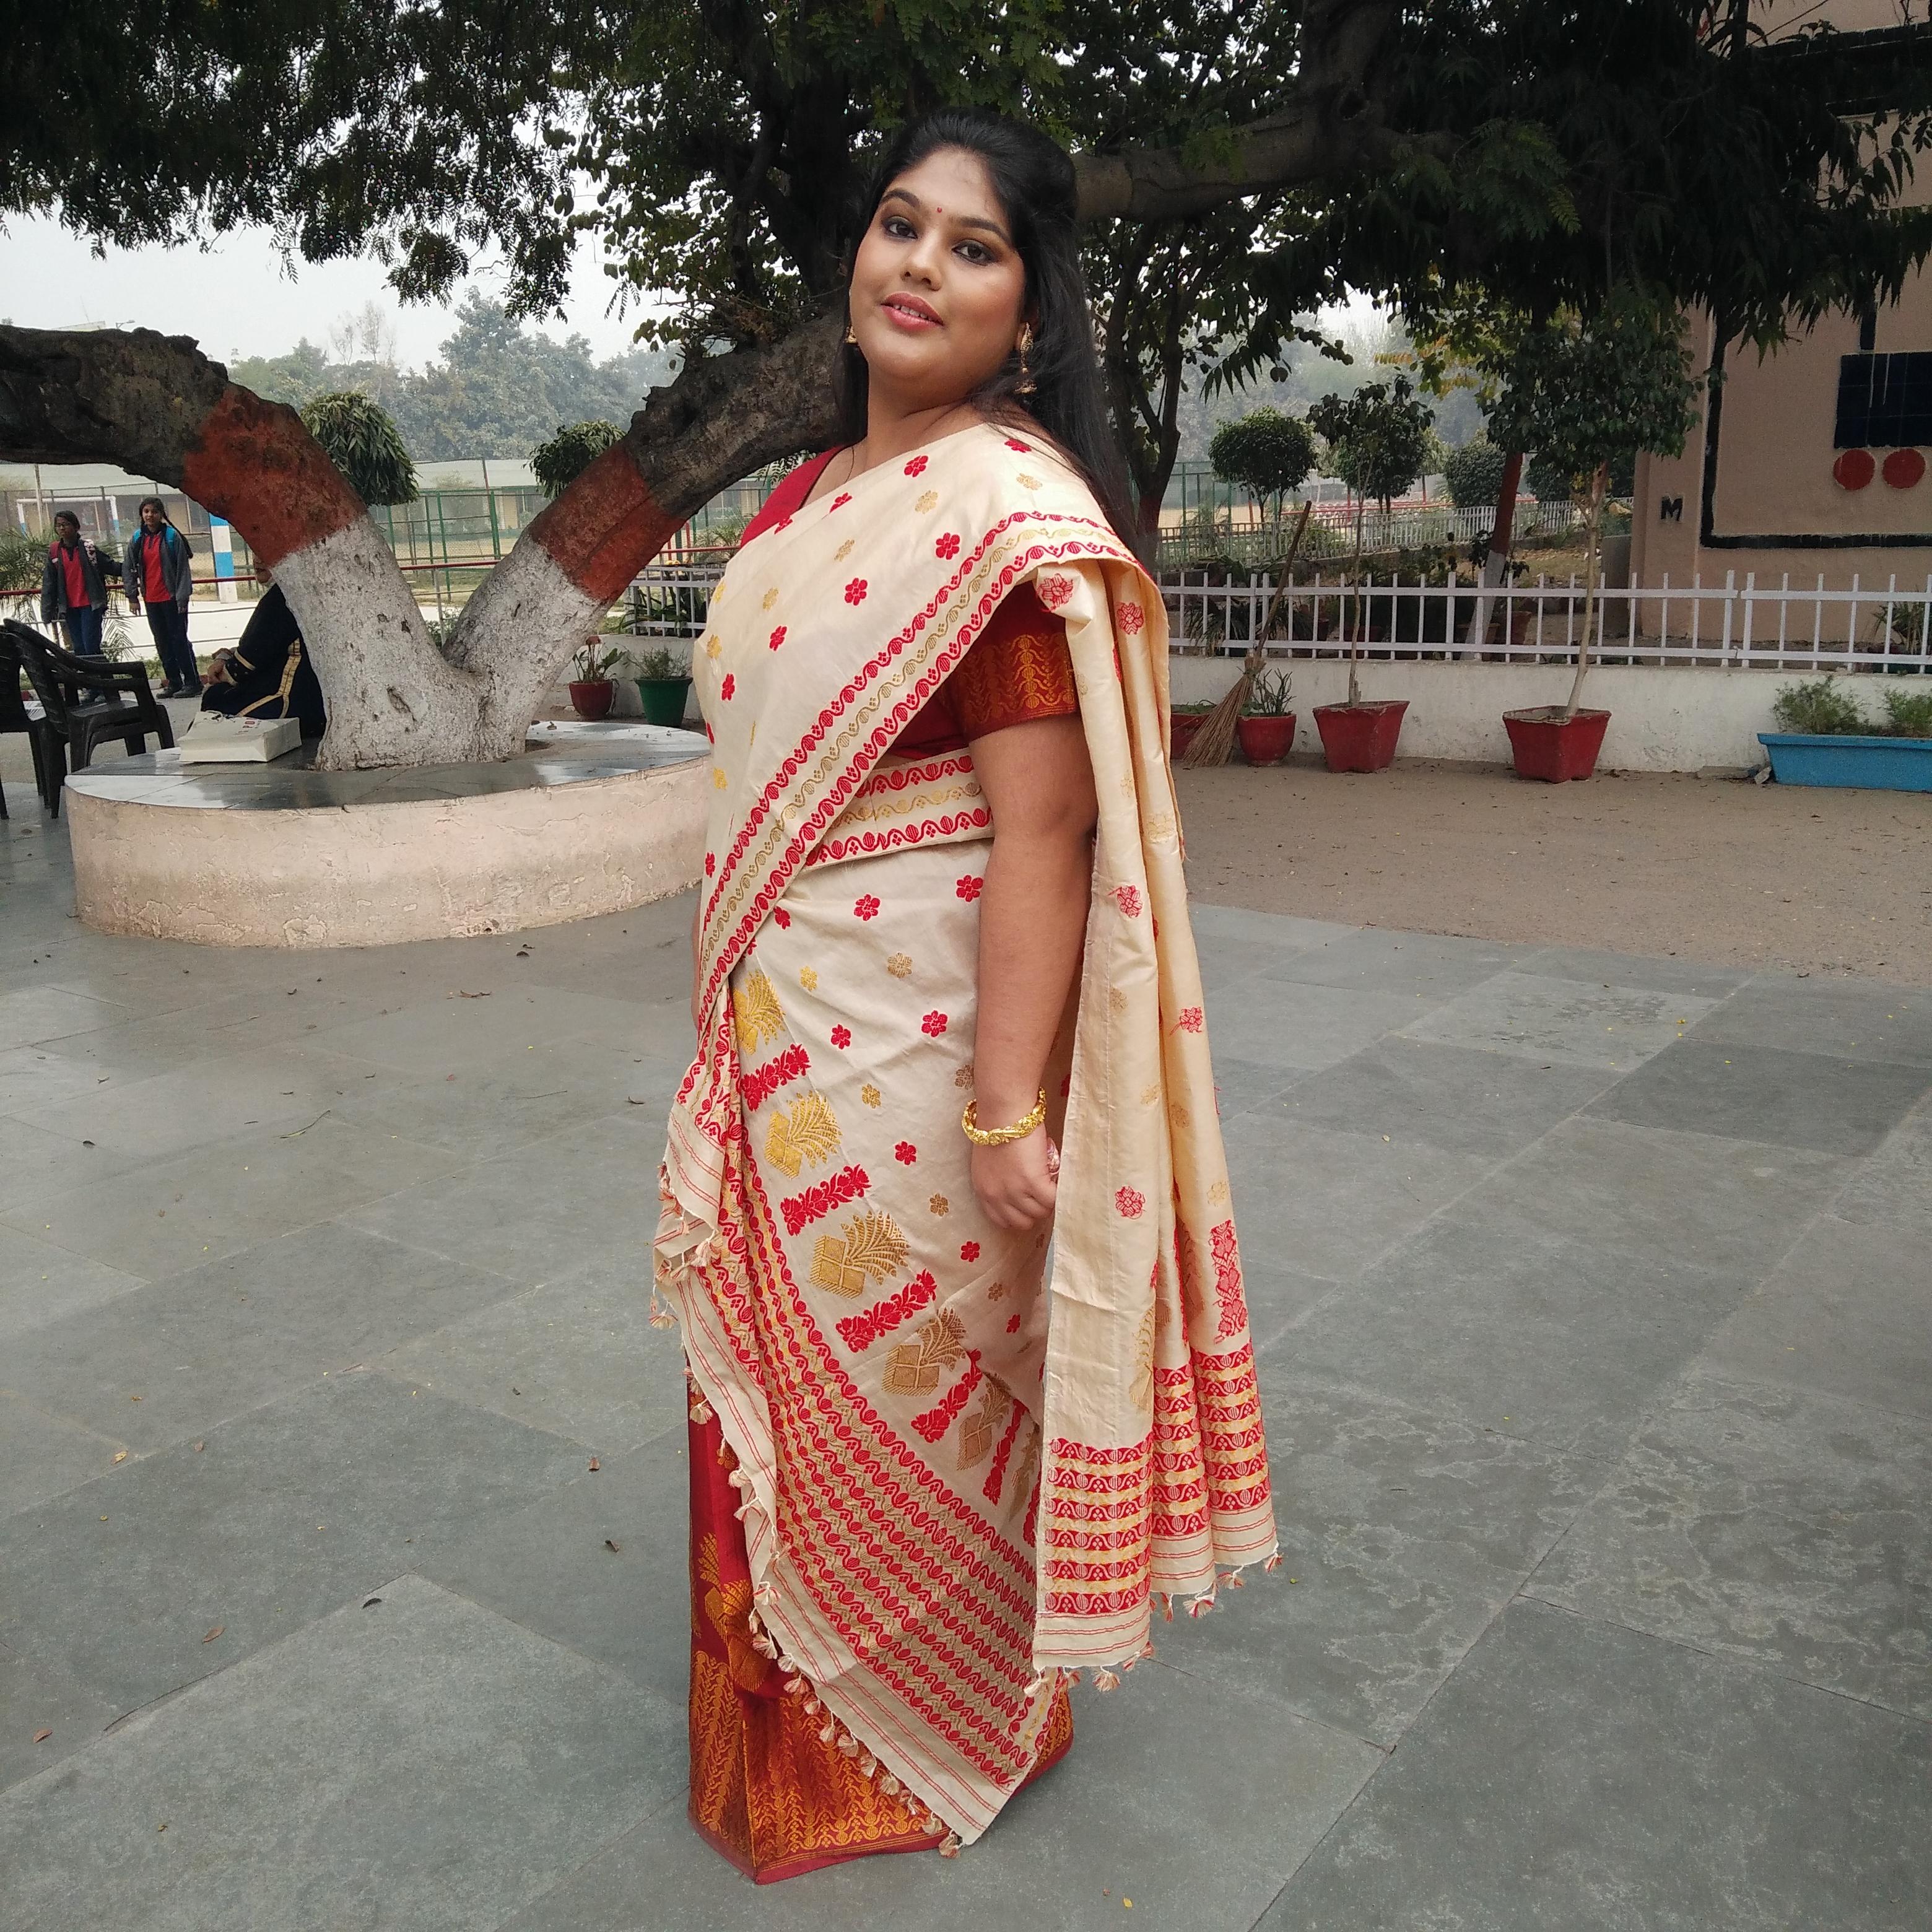 Shubhangi Saxena